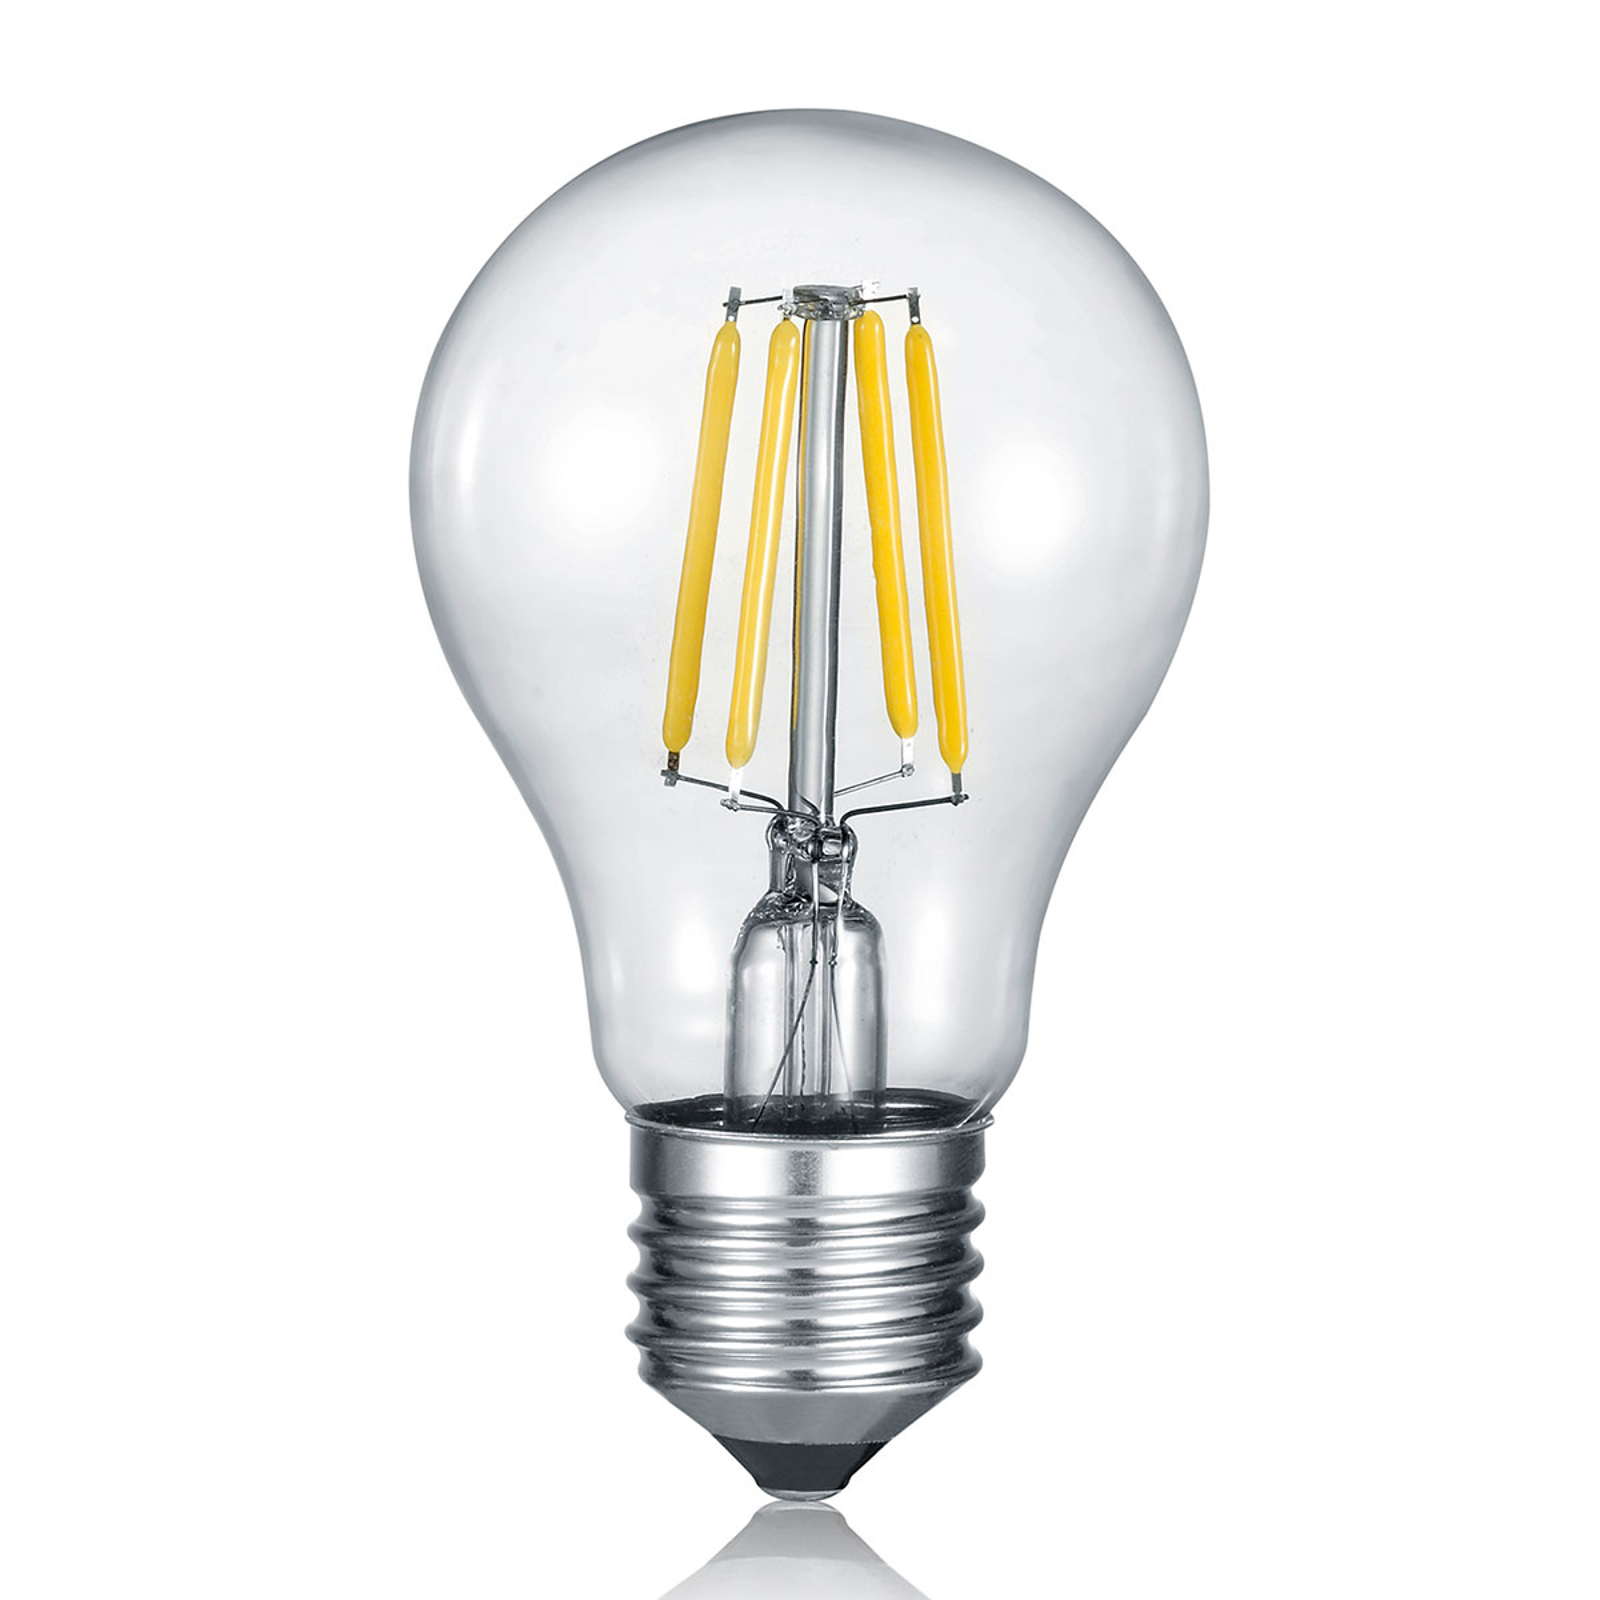 LED-filamentpære E27 8 W Switch Dimmer, 2700K